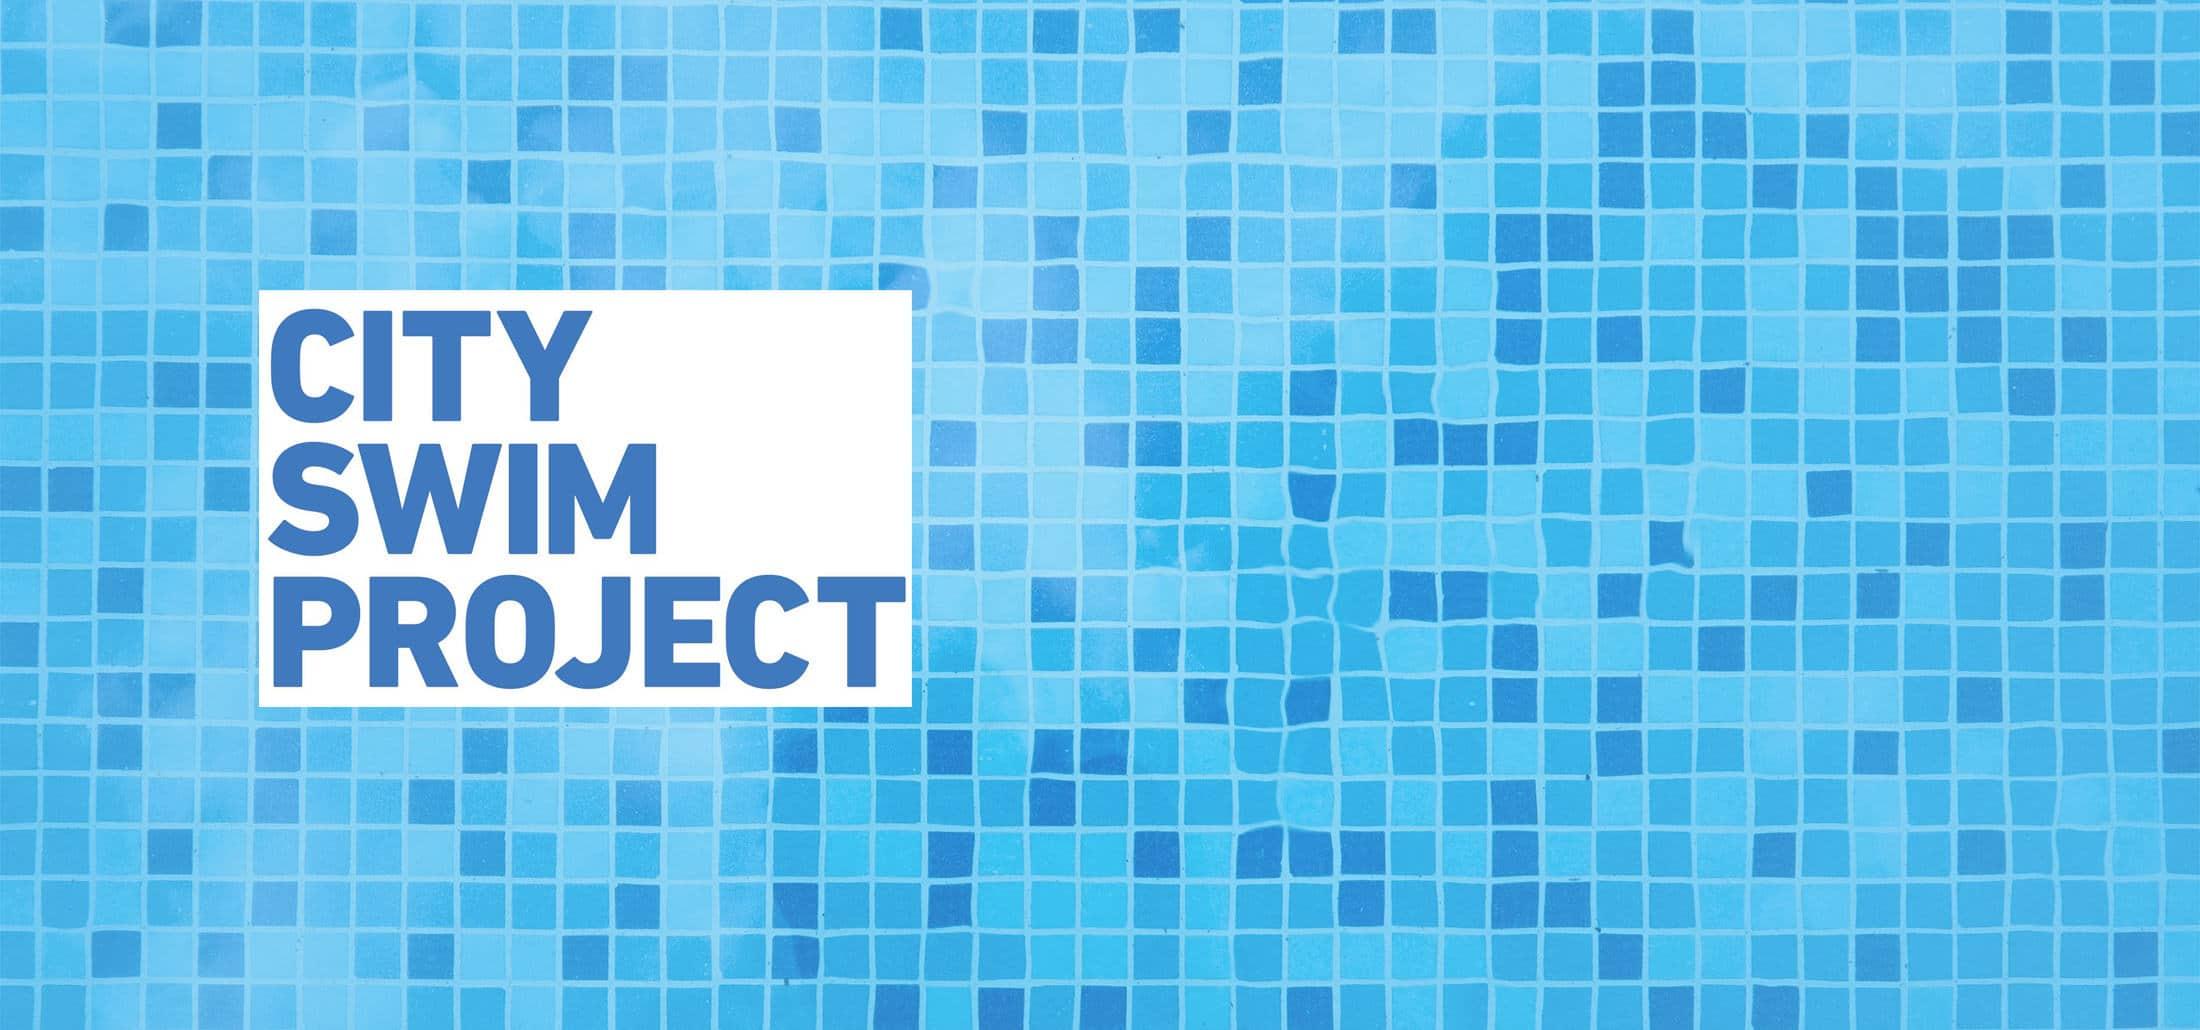 city swim project header